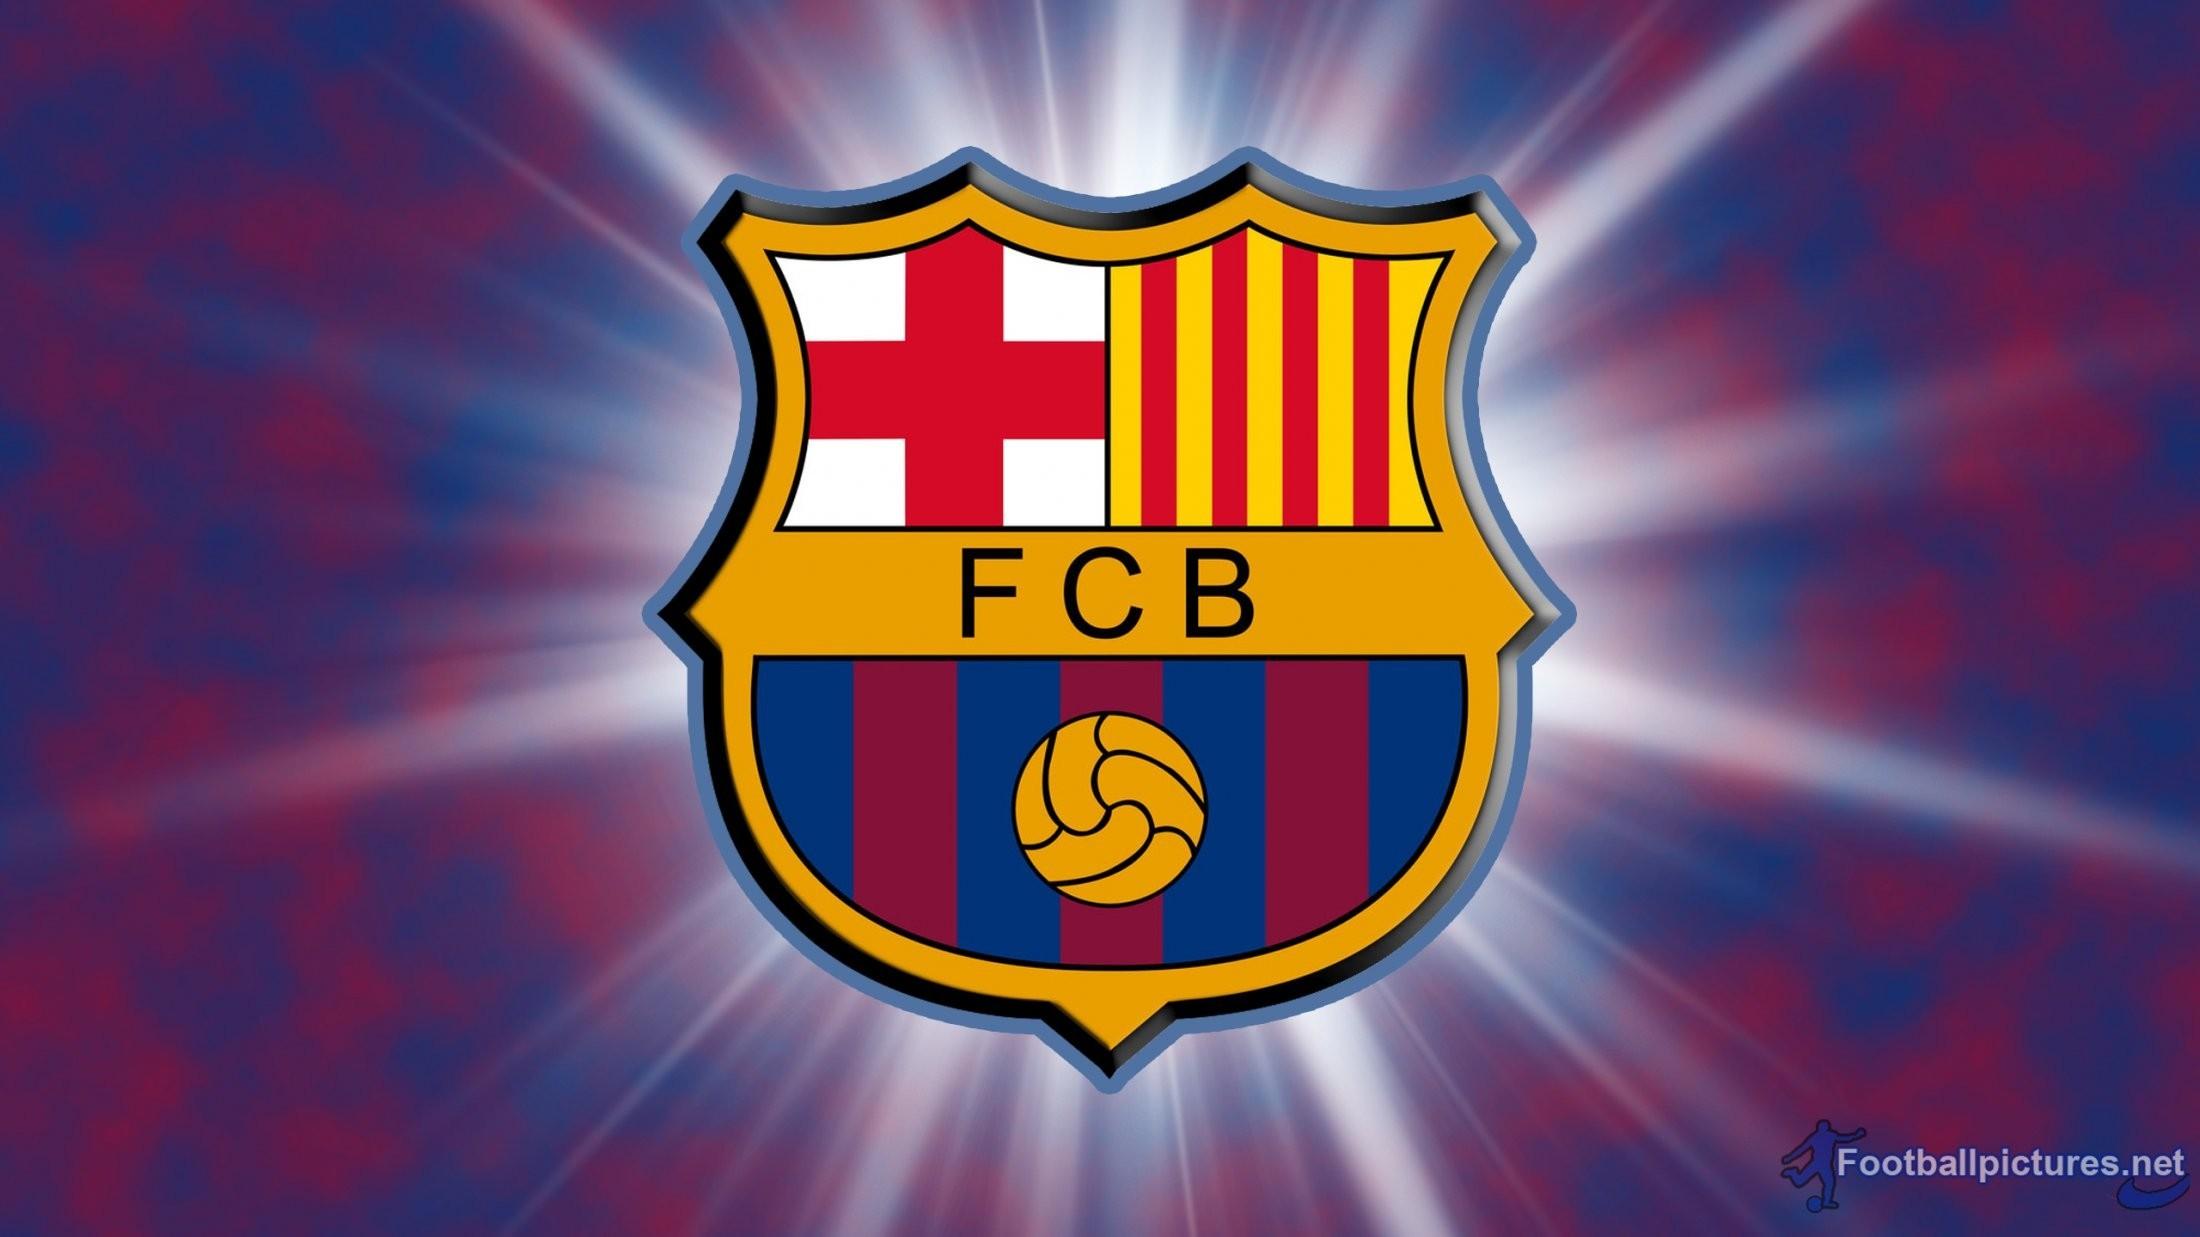 Barcelona Fc: Barcelona Logo 2018 Wallpaper (70+ Images